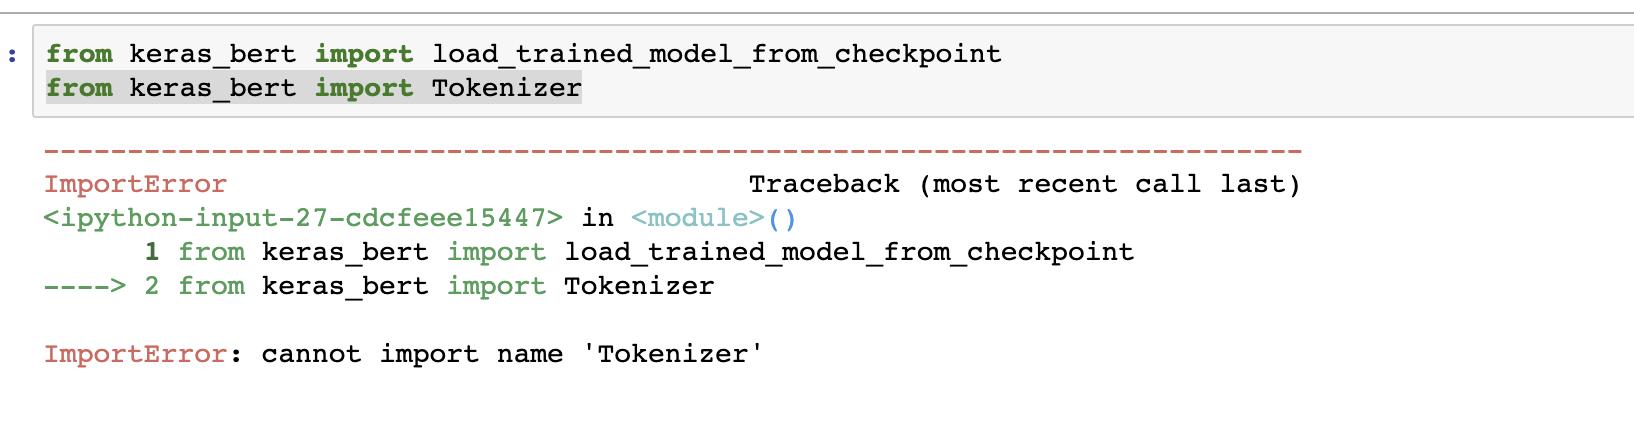 ImportError : cannot import name 'Tokenizer' · Issue #49